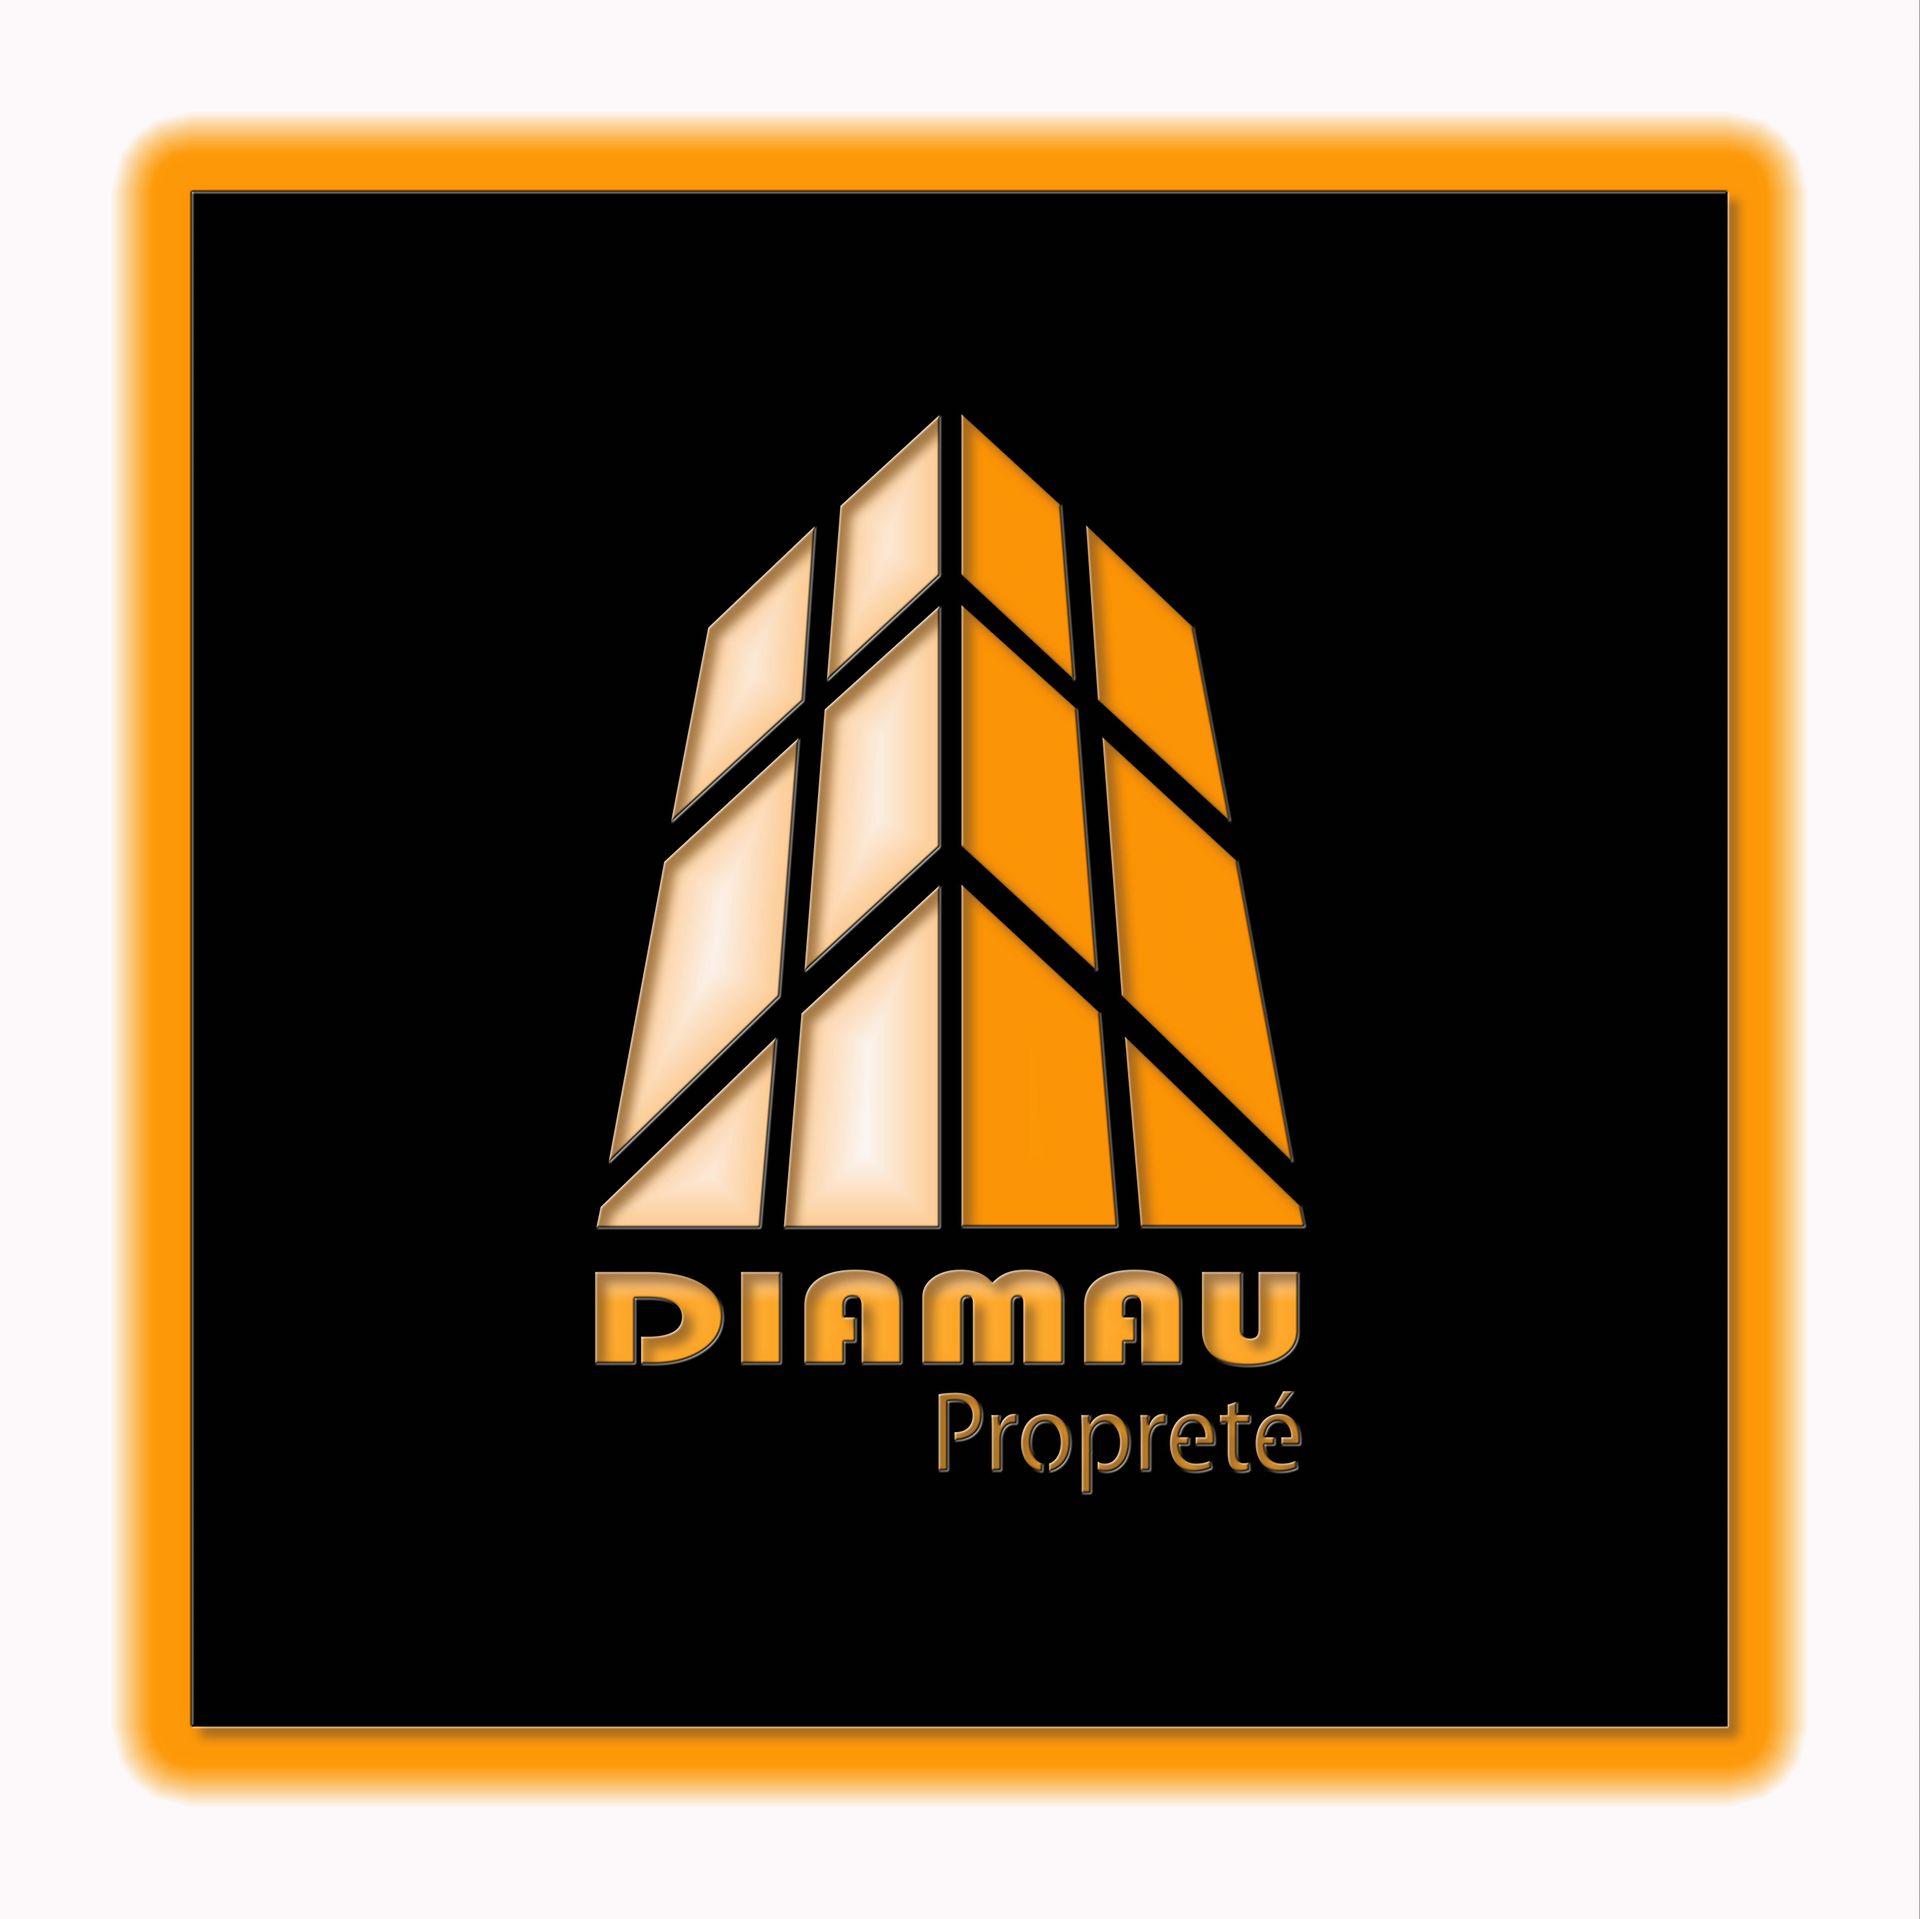 Logo Diamau Propreté